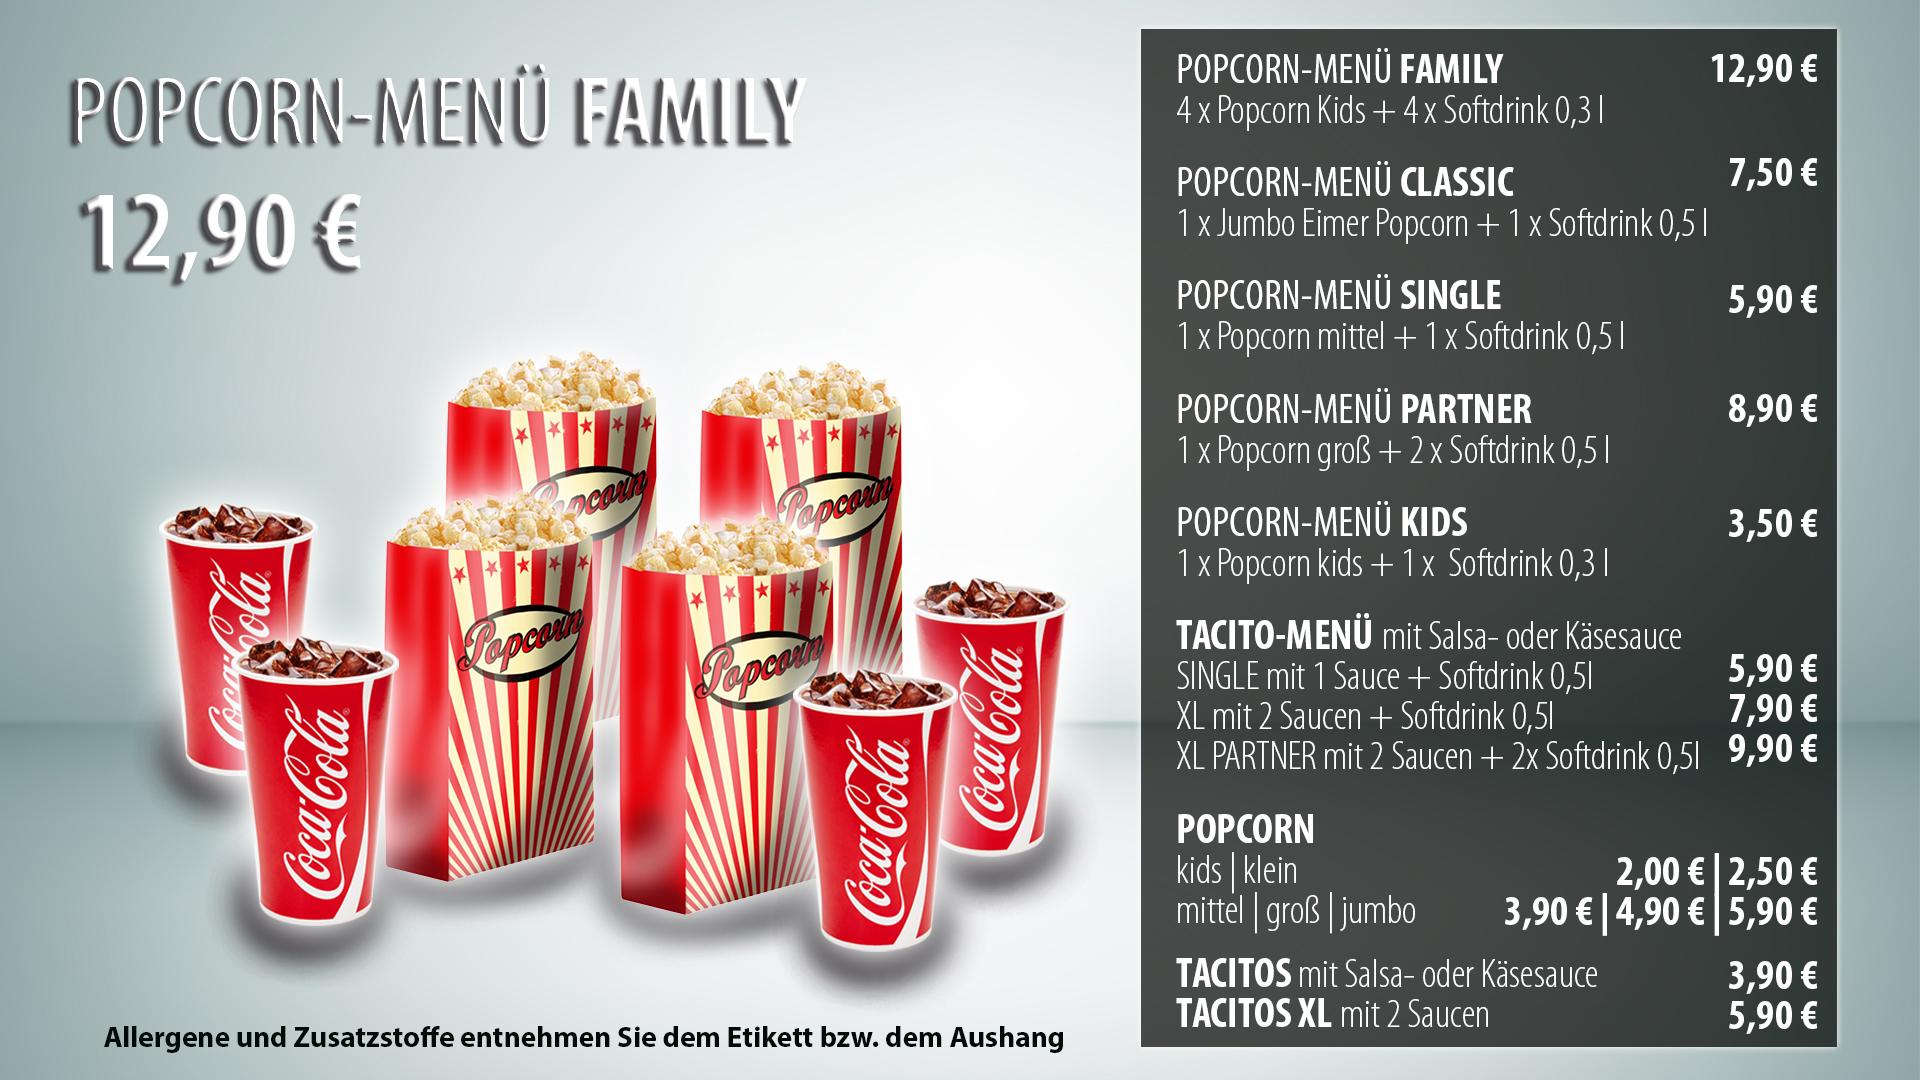 Capitol Kino Plauen